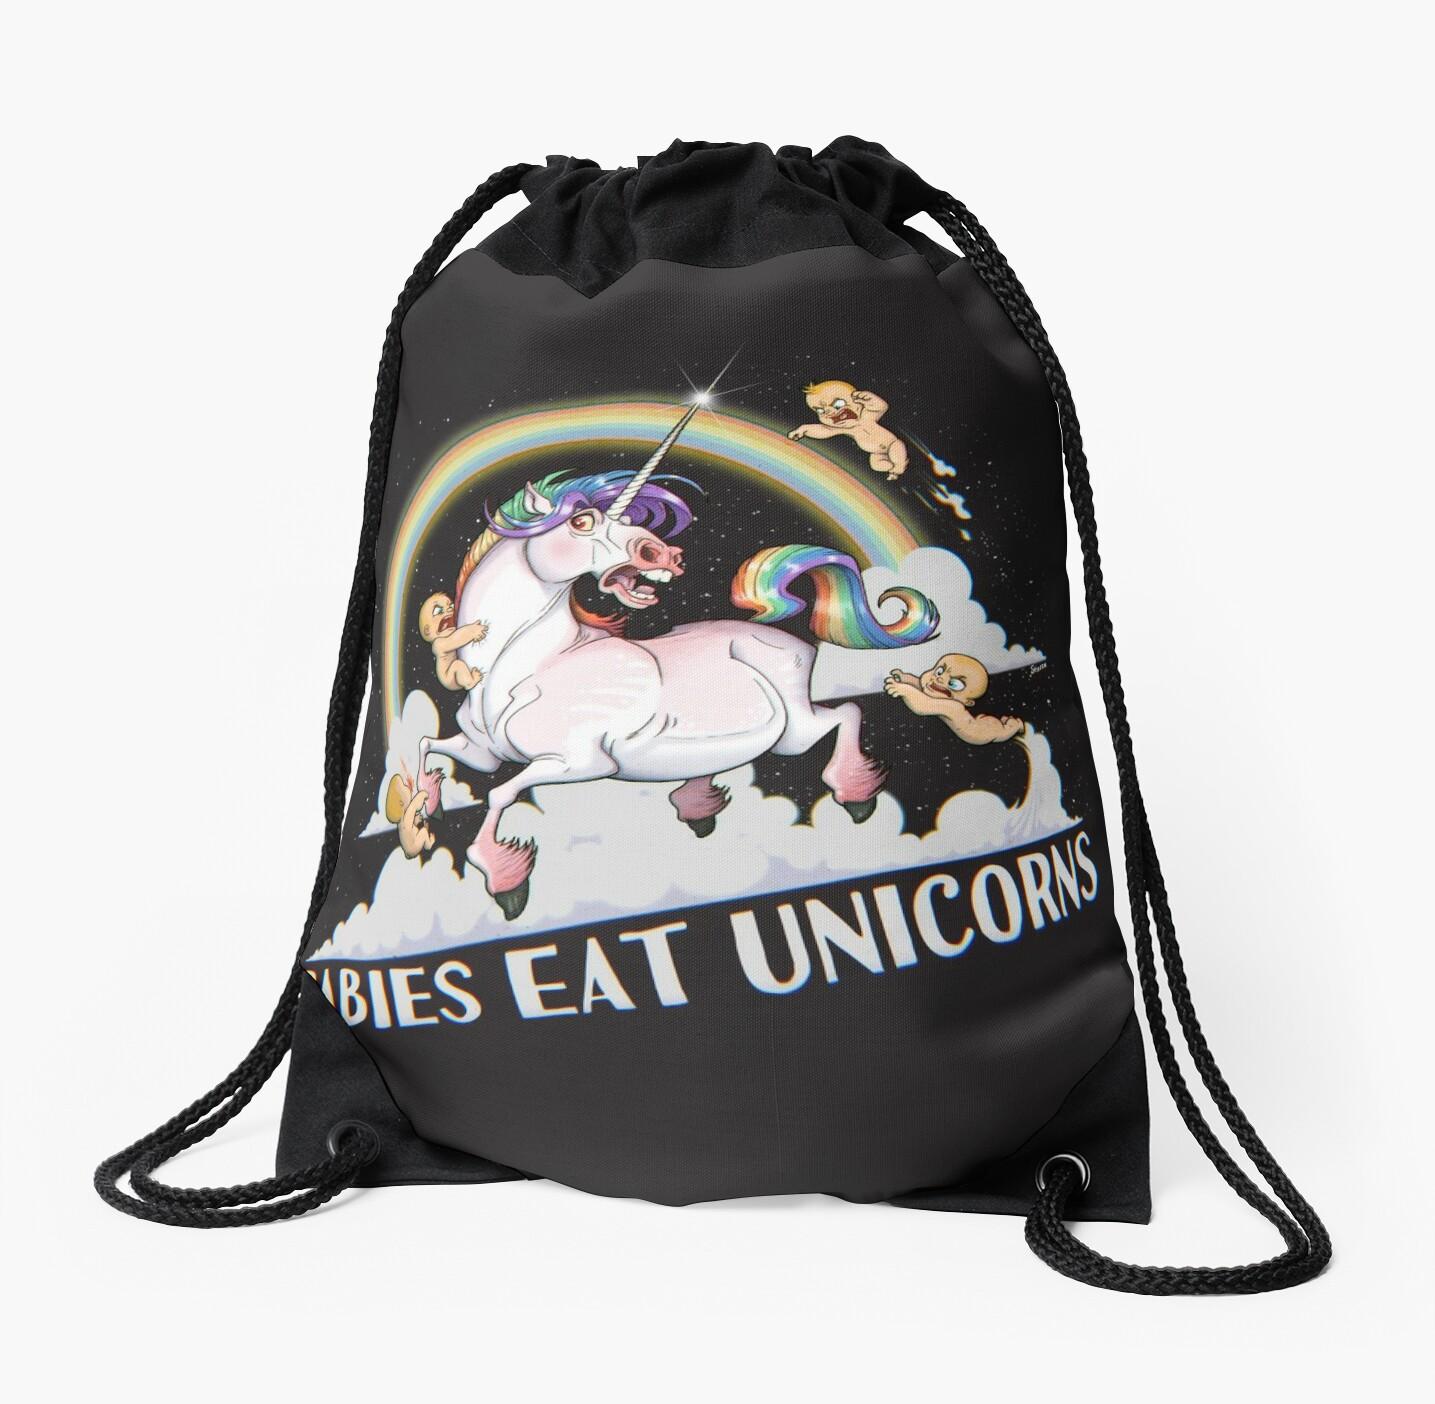 Babies eat Unicorns by stieven